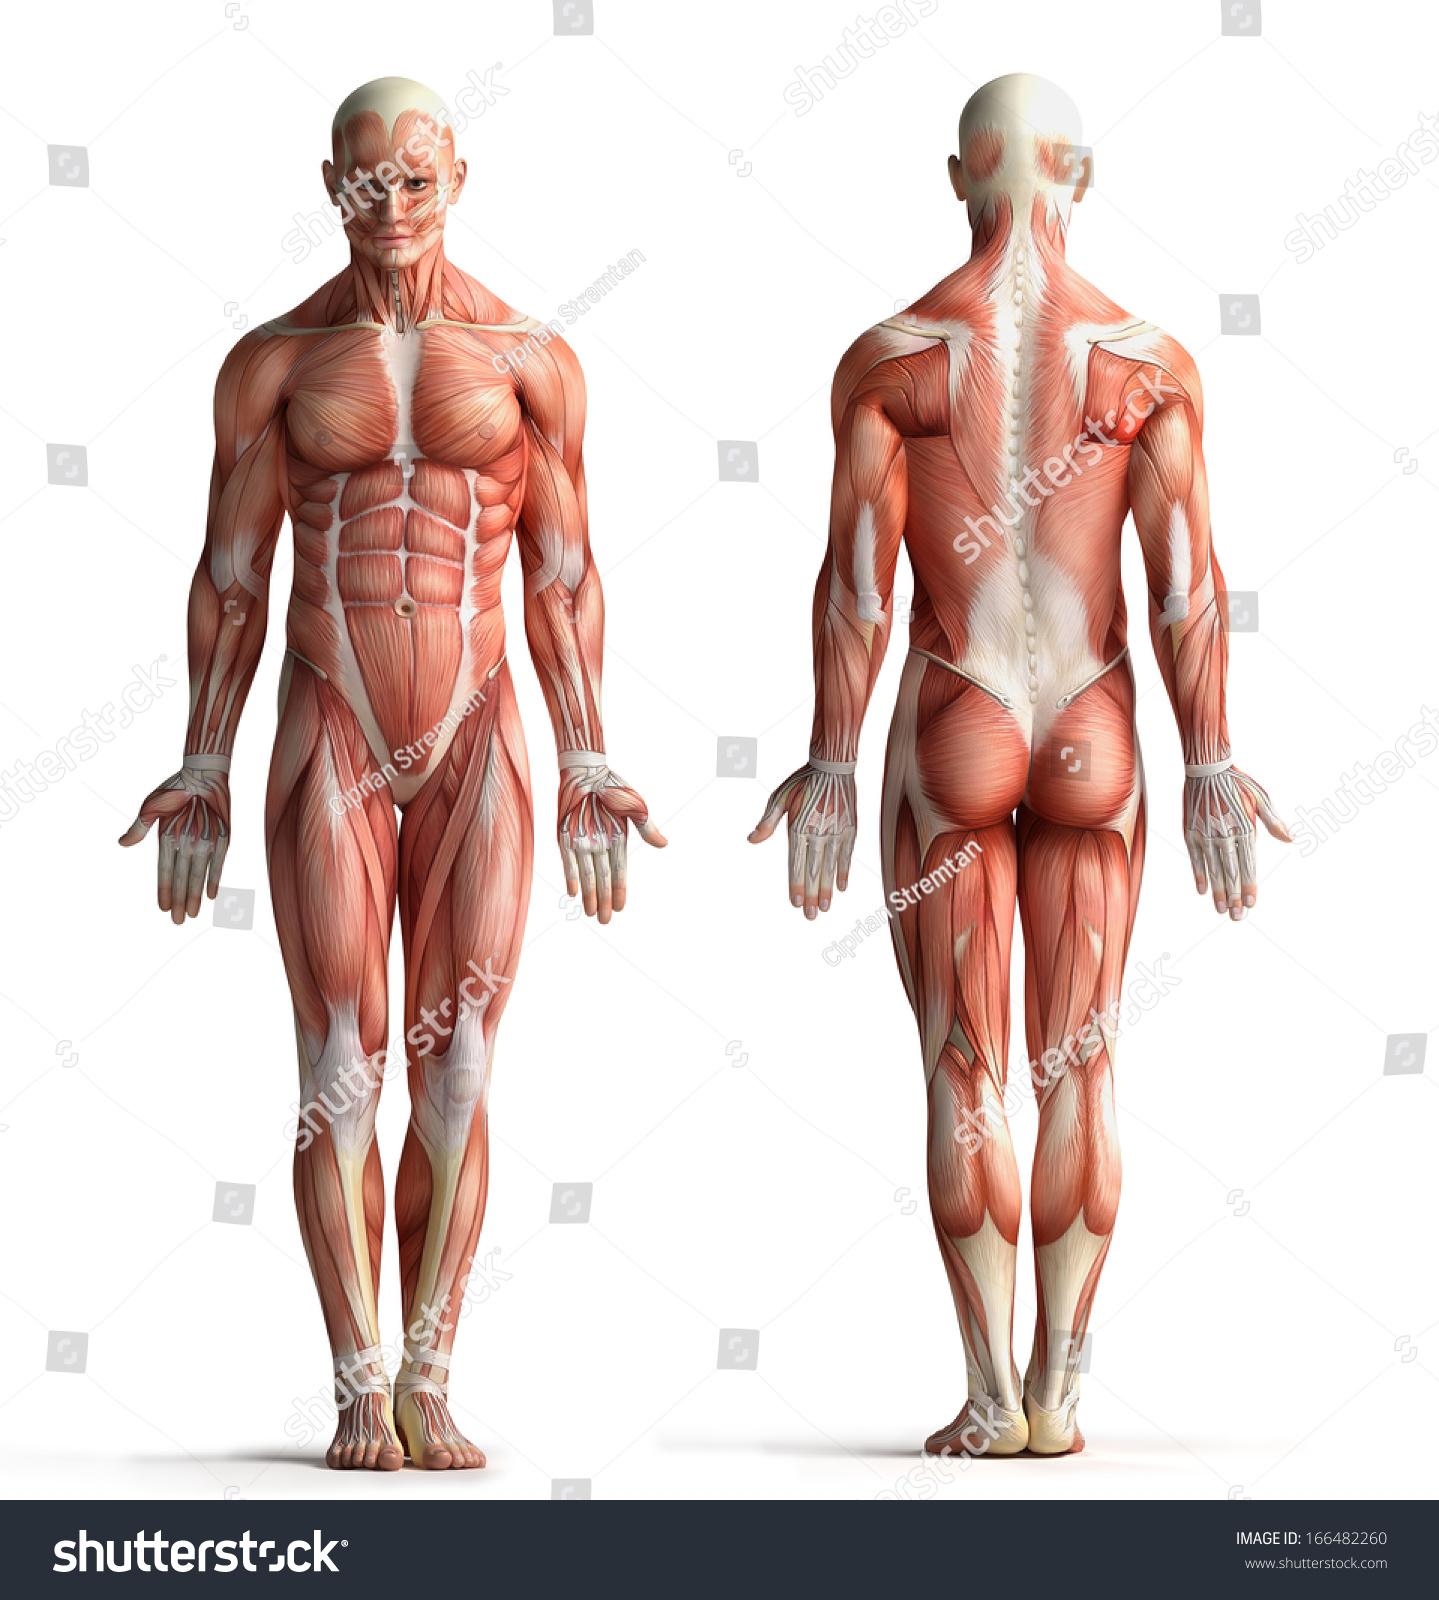 Male Anatomy View Stock Illustration 166482260 - Shutterstock